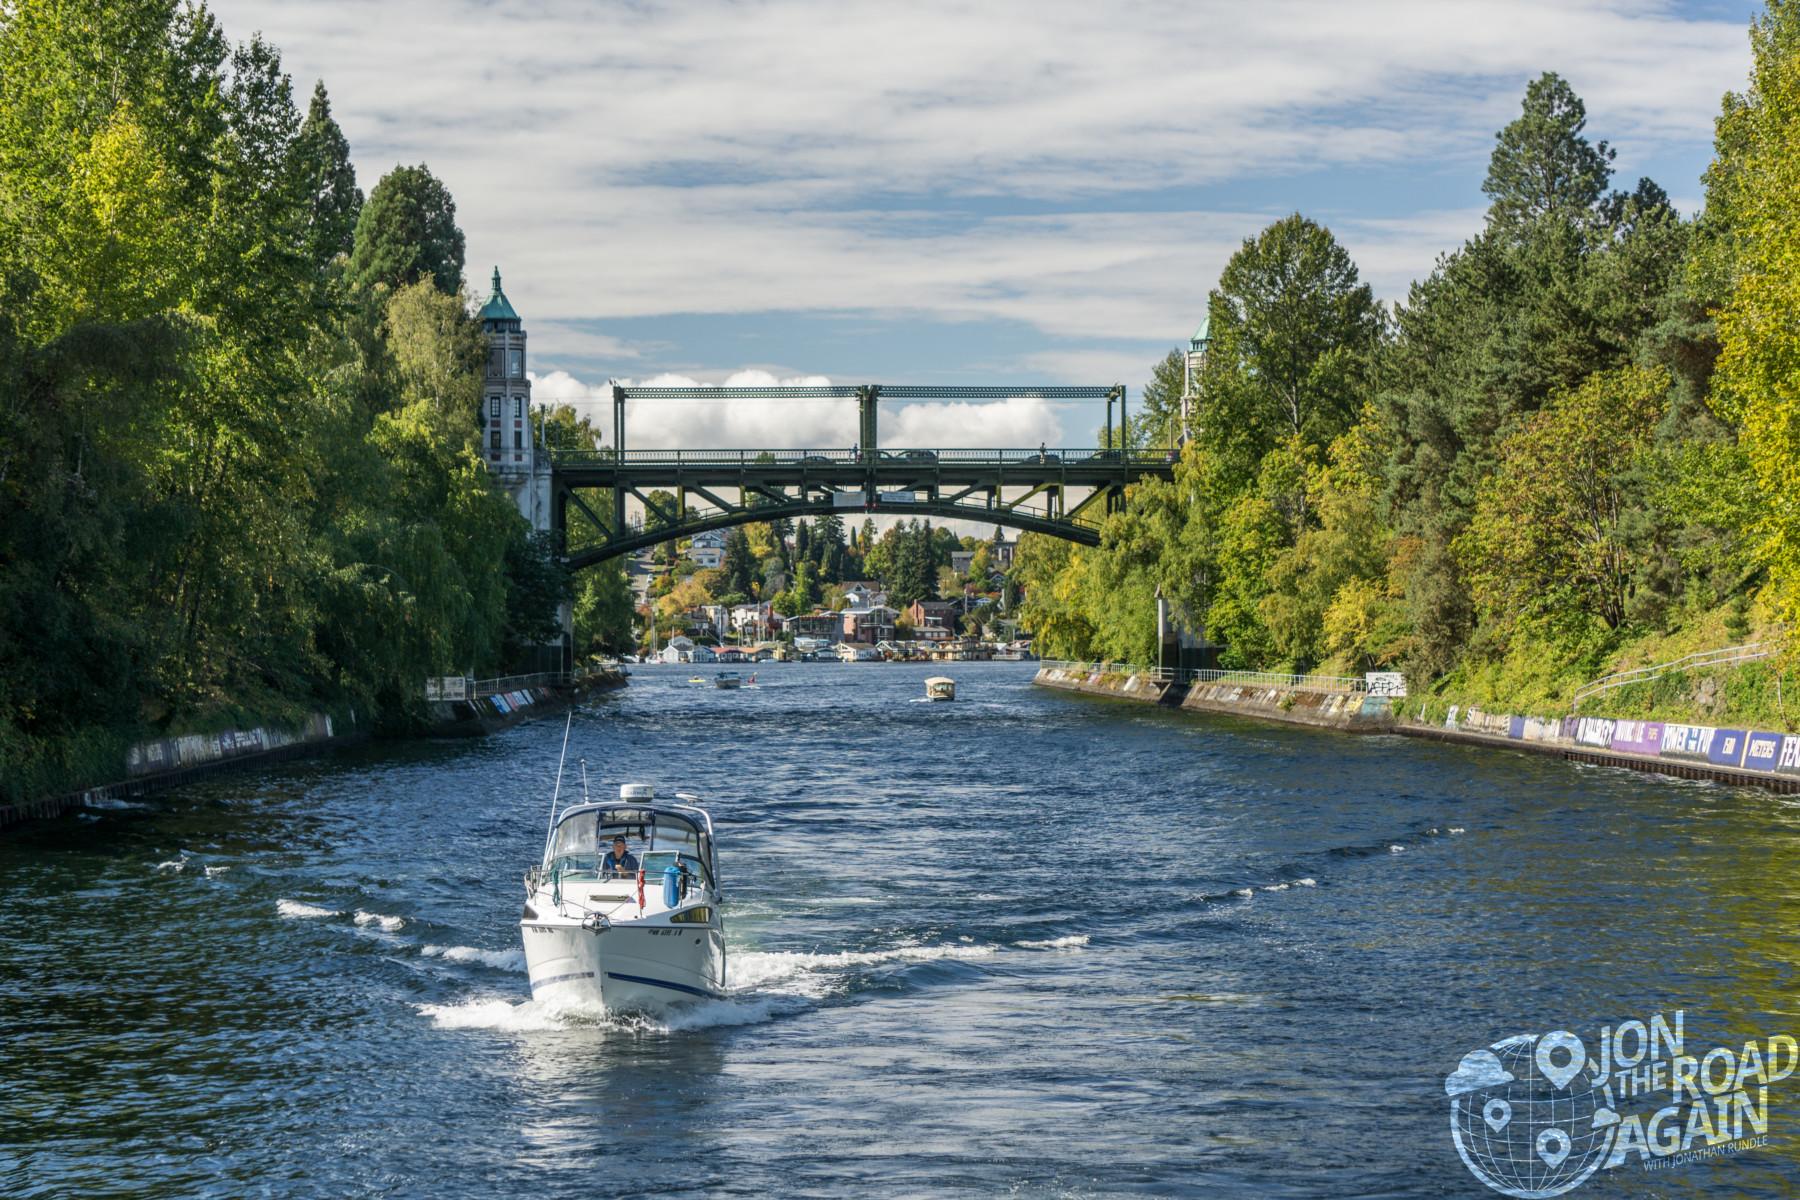 University bridge and montlake cut in Seattle